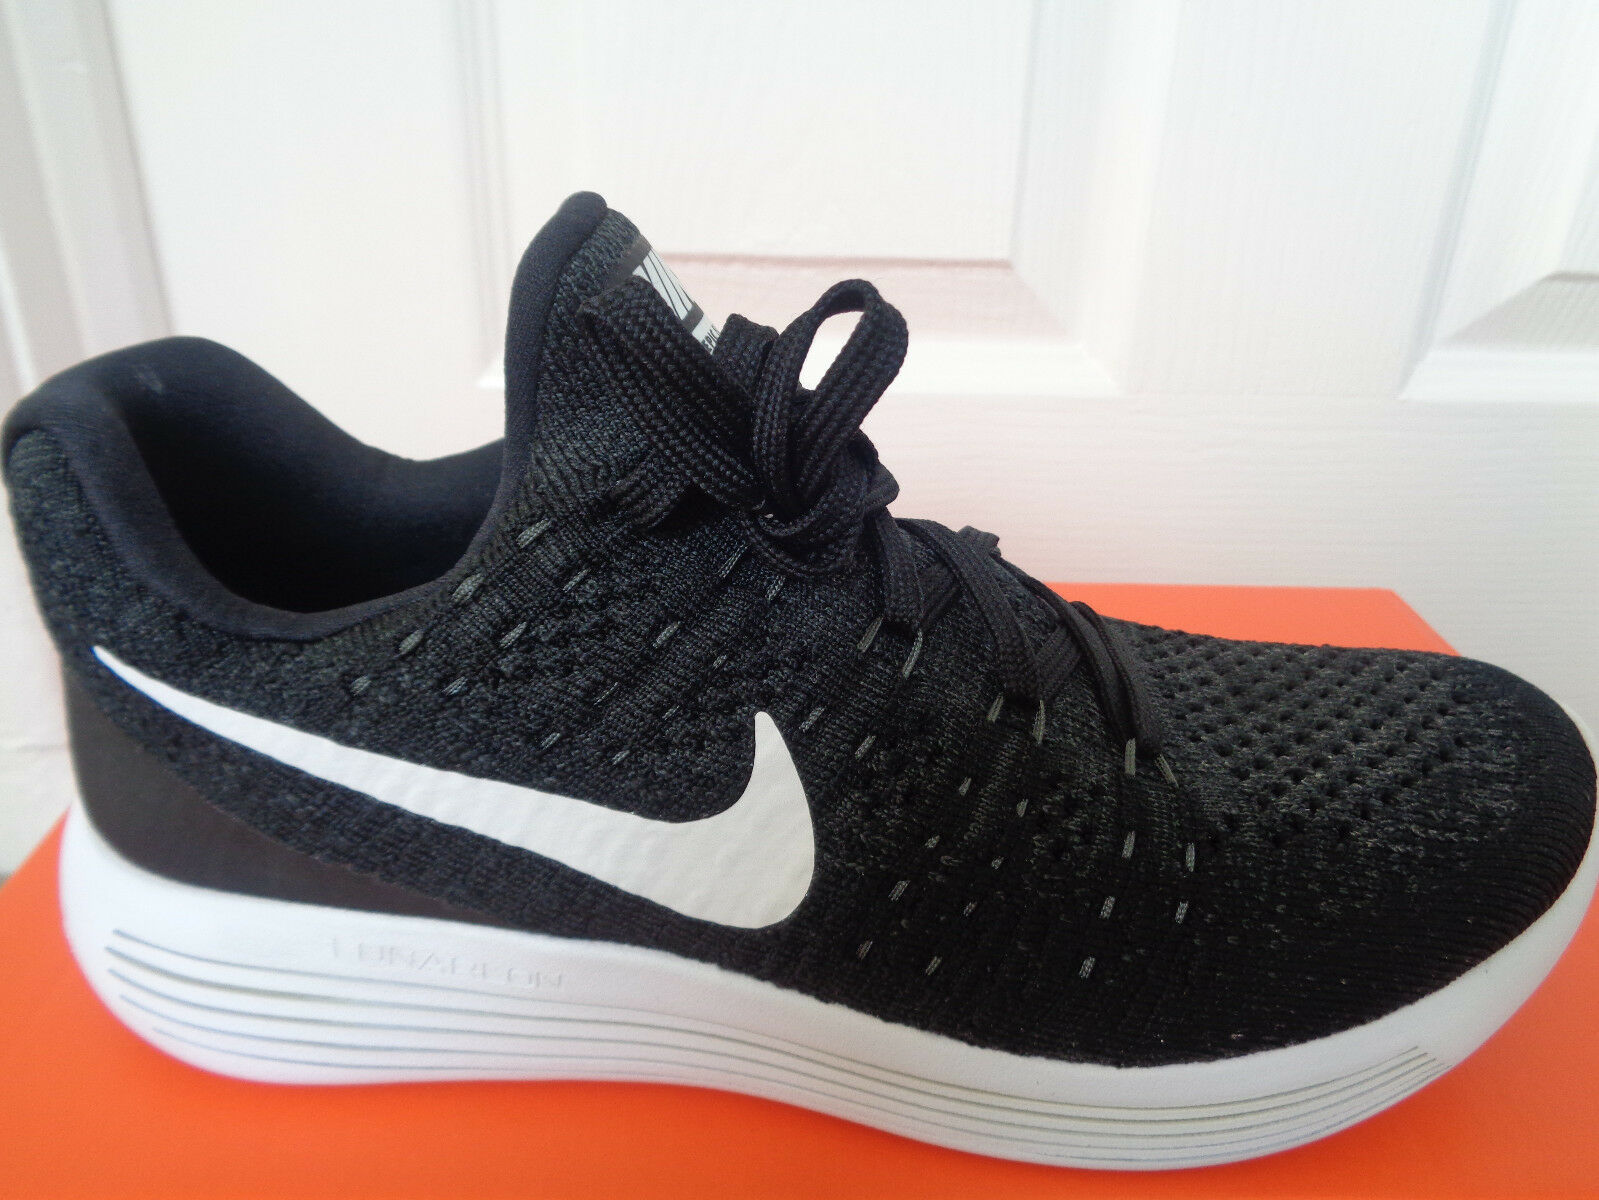 f7db2a340d6c Nike lunarepic basso Flyknit 2 WMN WMN WMN scarpe da ginnastica 863780 001  EU 38.5 US 7.5 Nuovo + Scatola 081eb1